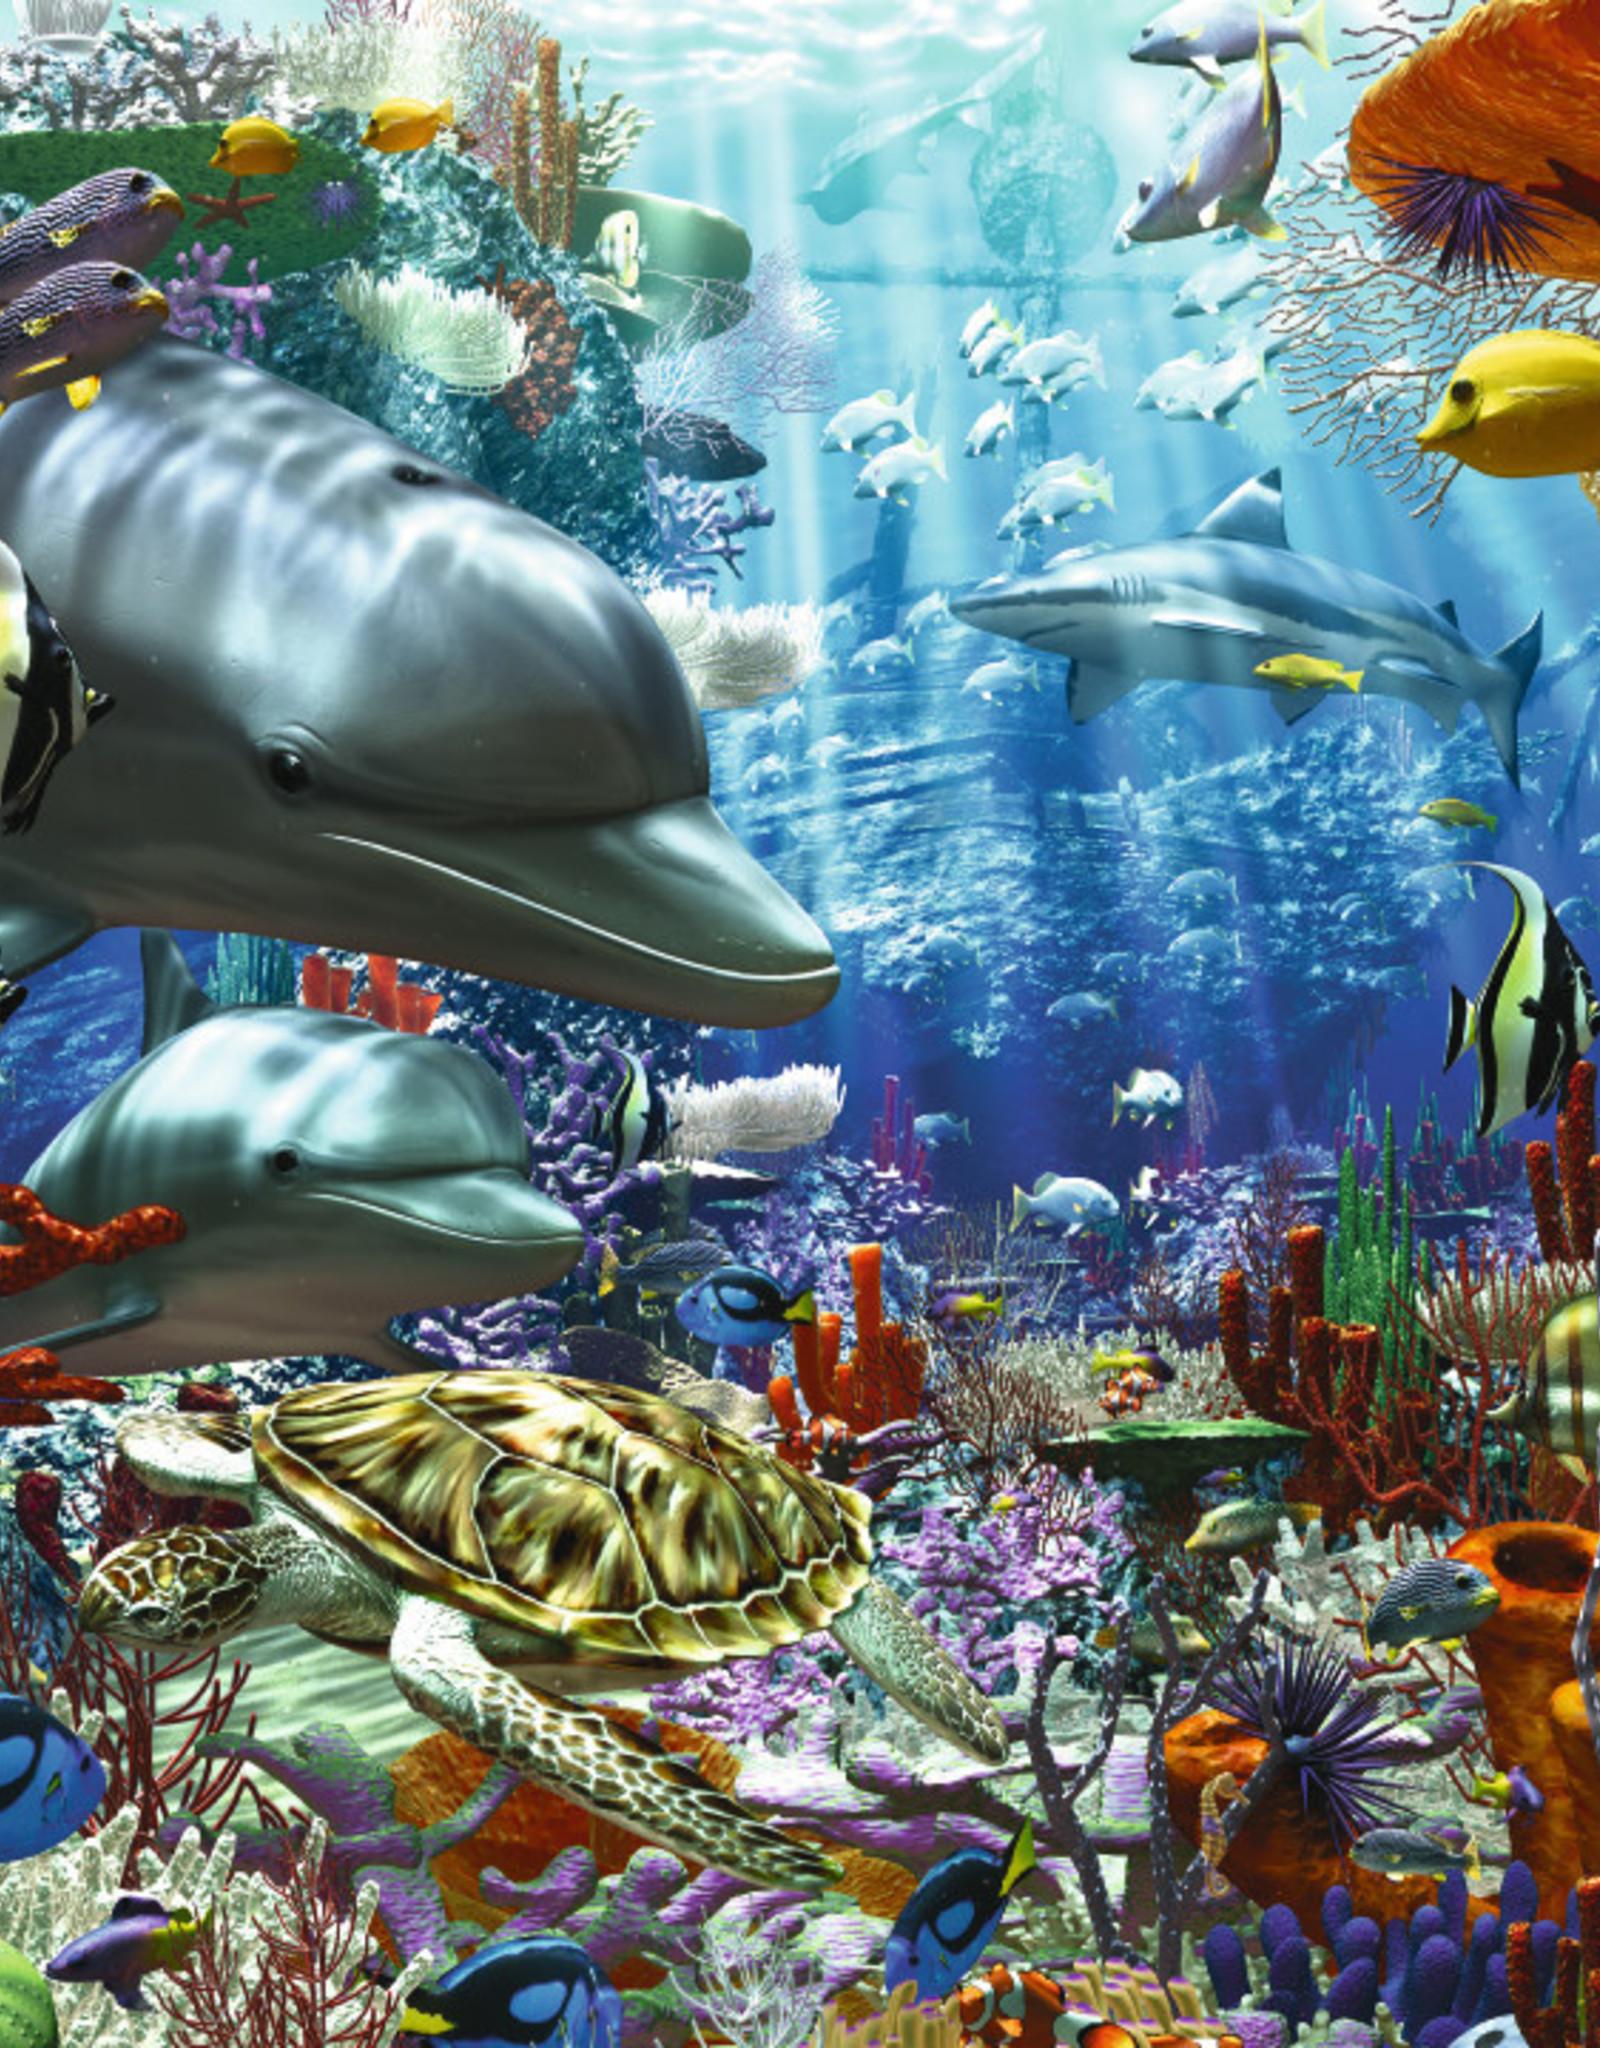 Ravensburger Oceanic Wonders 3000pc Puzzle